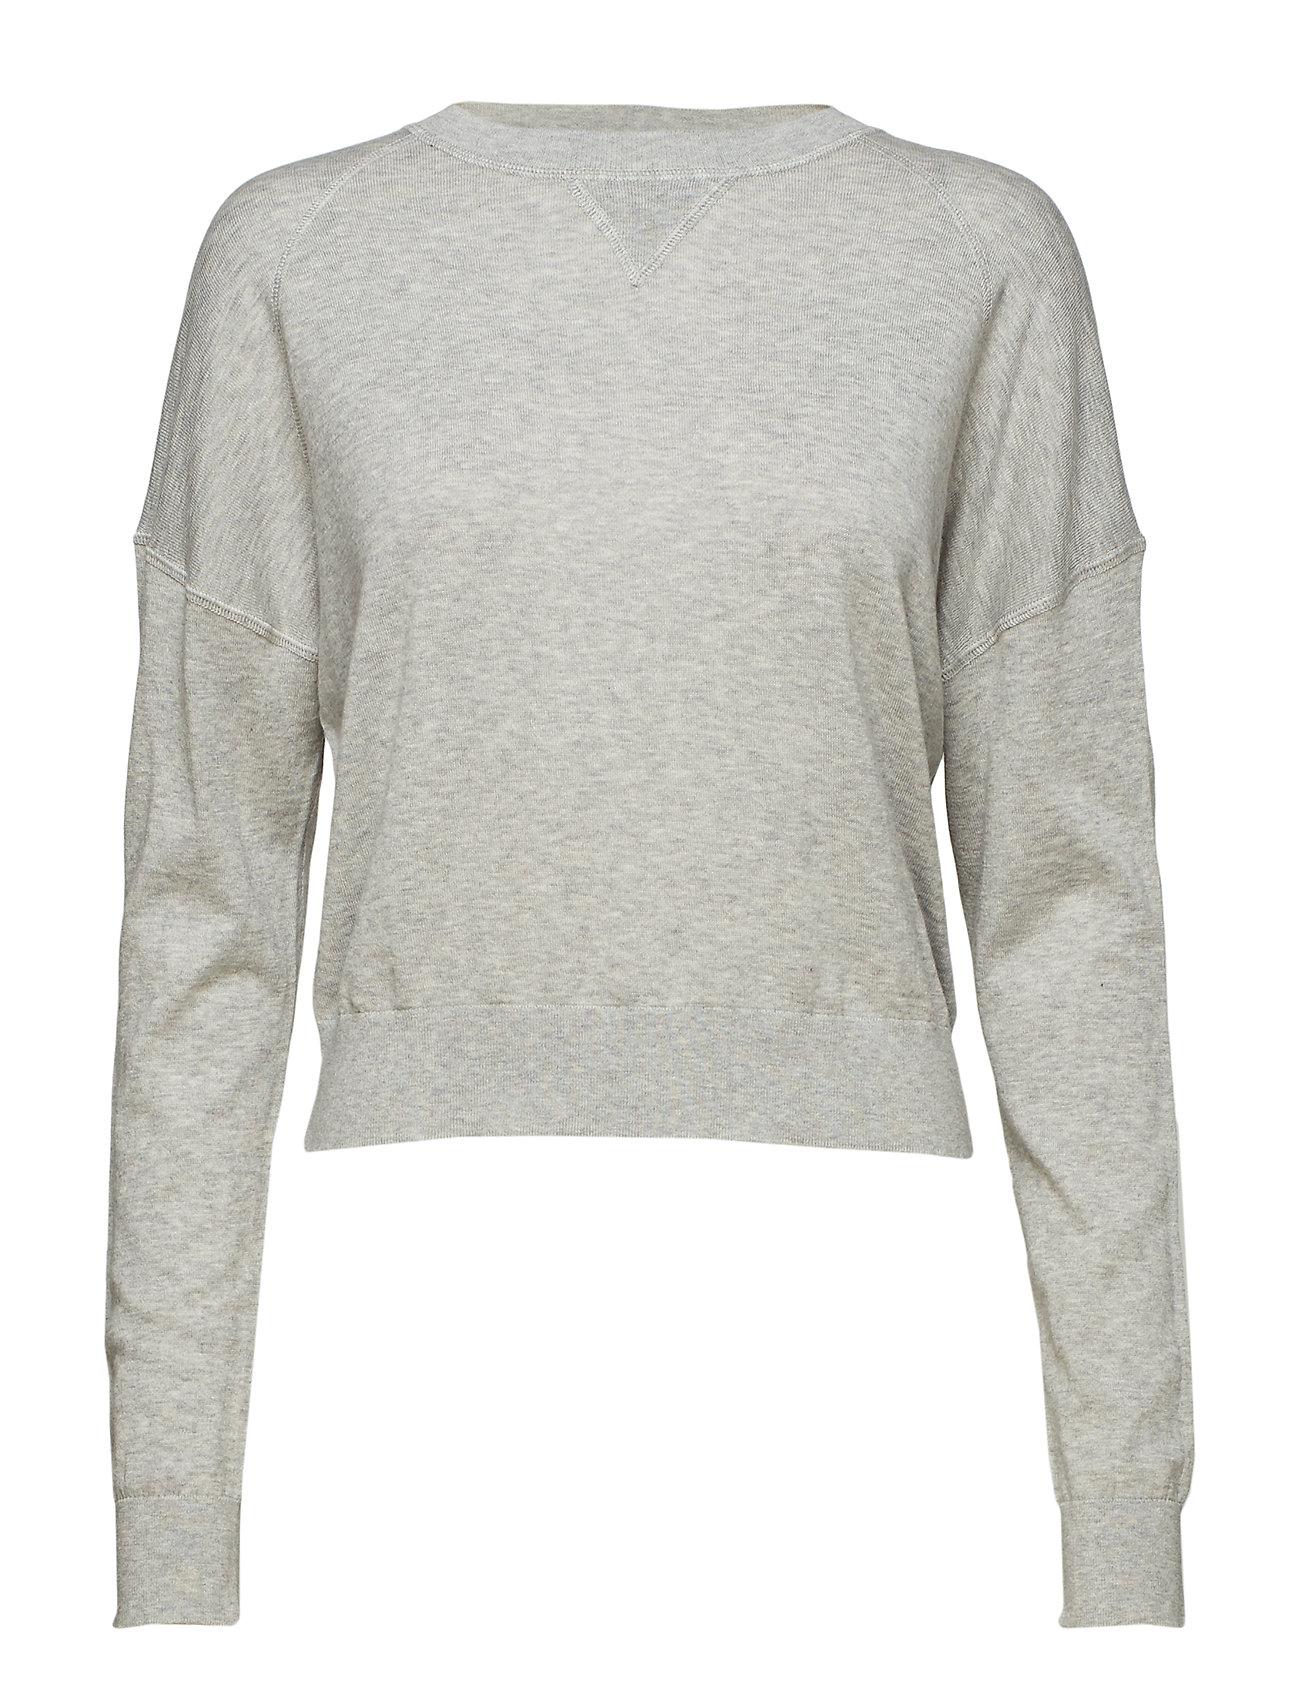 Knit Soft Sport GreyFilippa Light Sweatshirtlight K lFKTc1J3